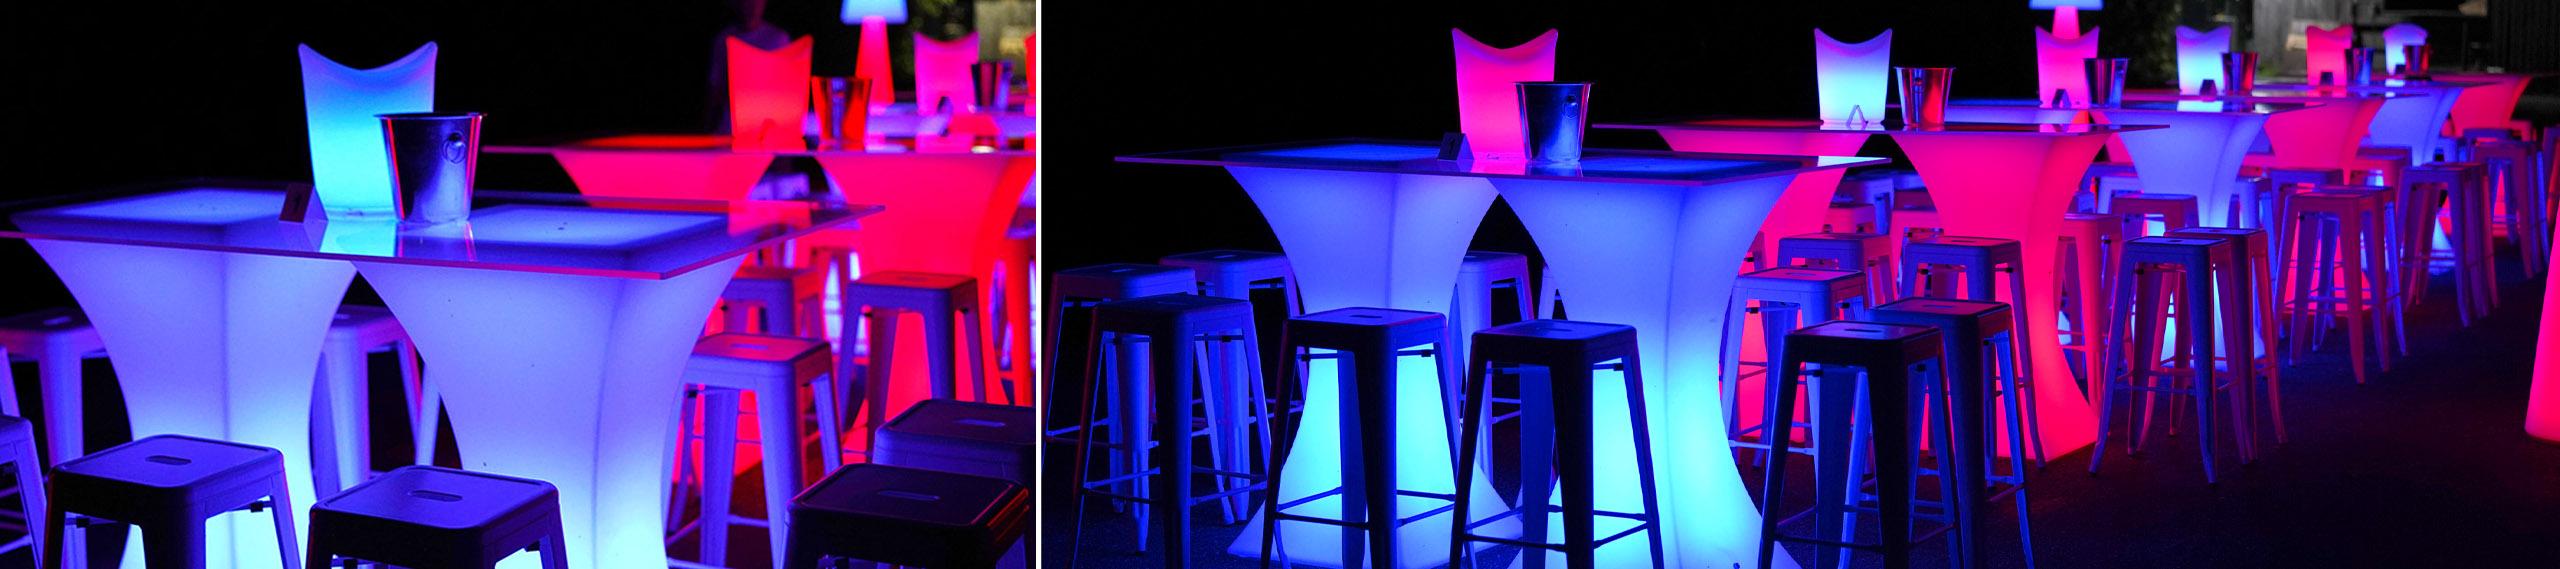 glow-table-high-top-miami